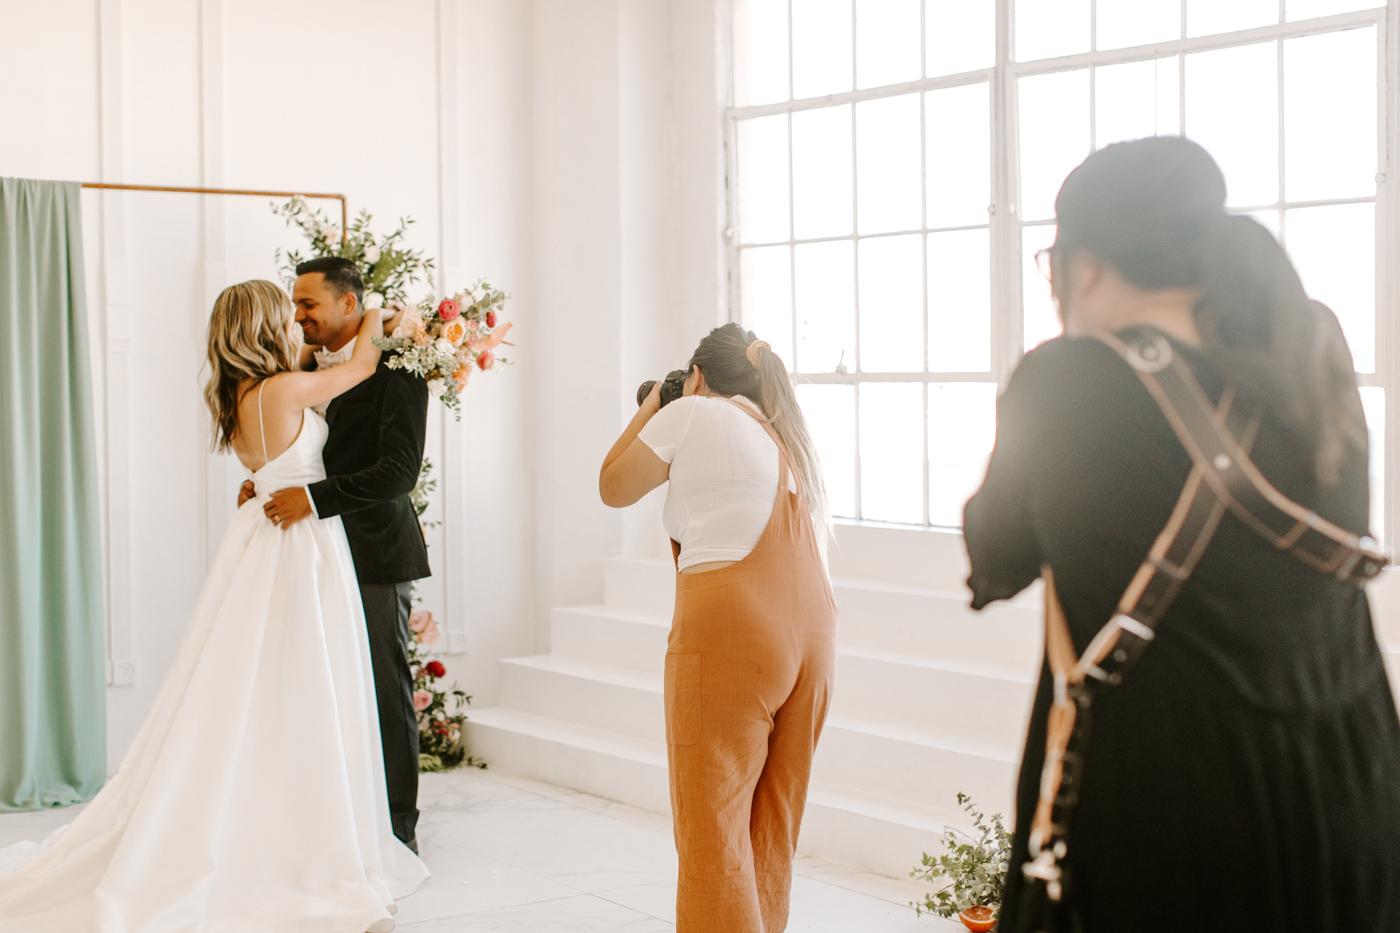 Brianna Broyles Photography - The Shootout Society- Rooftop Modern Wedding-30.jpg